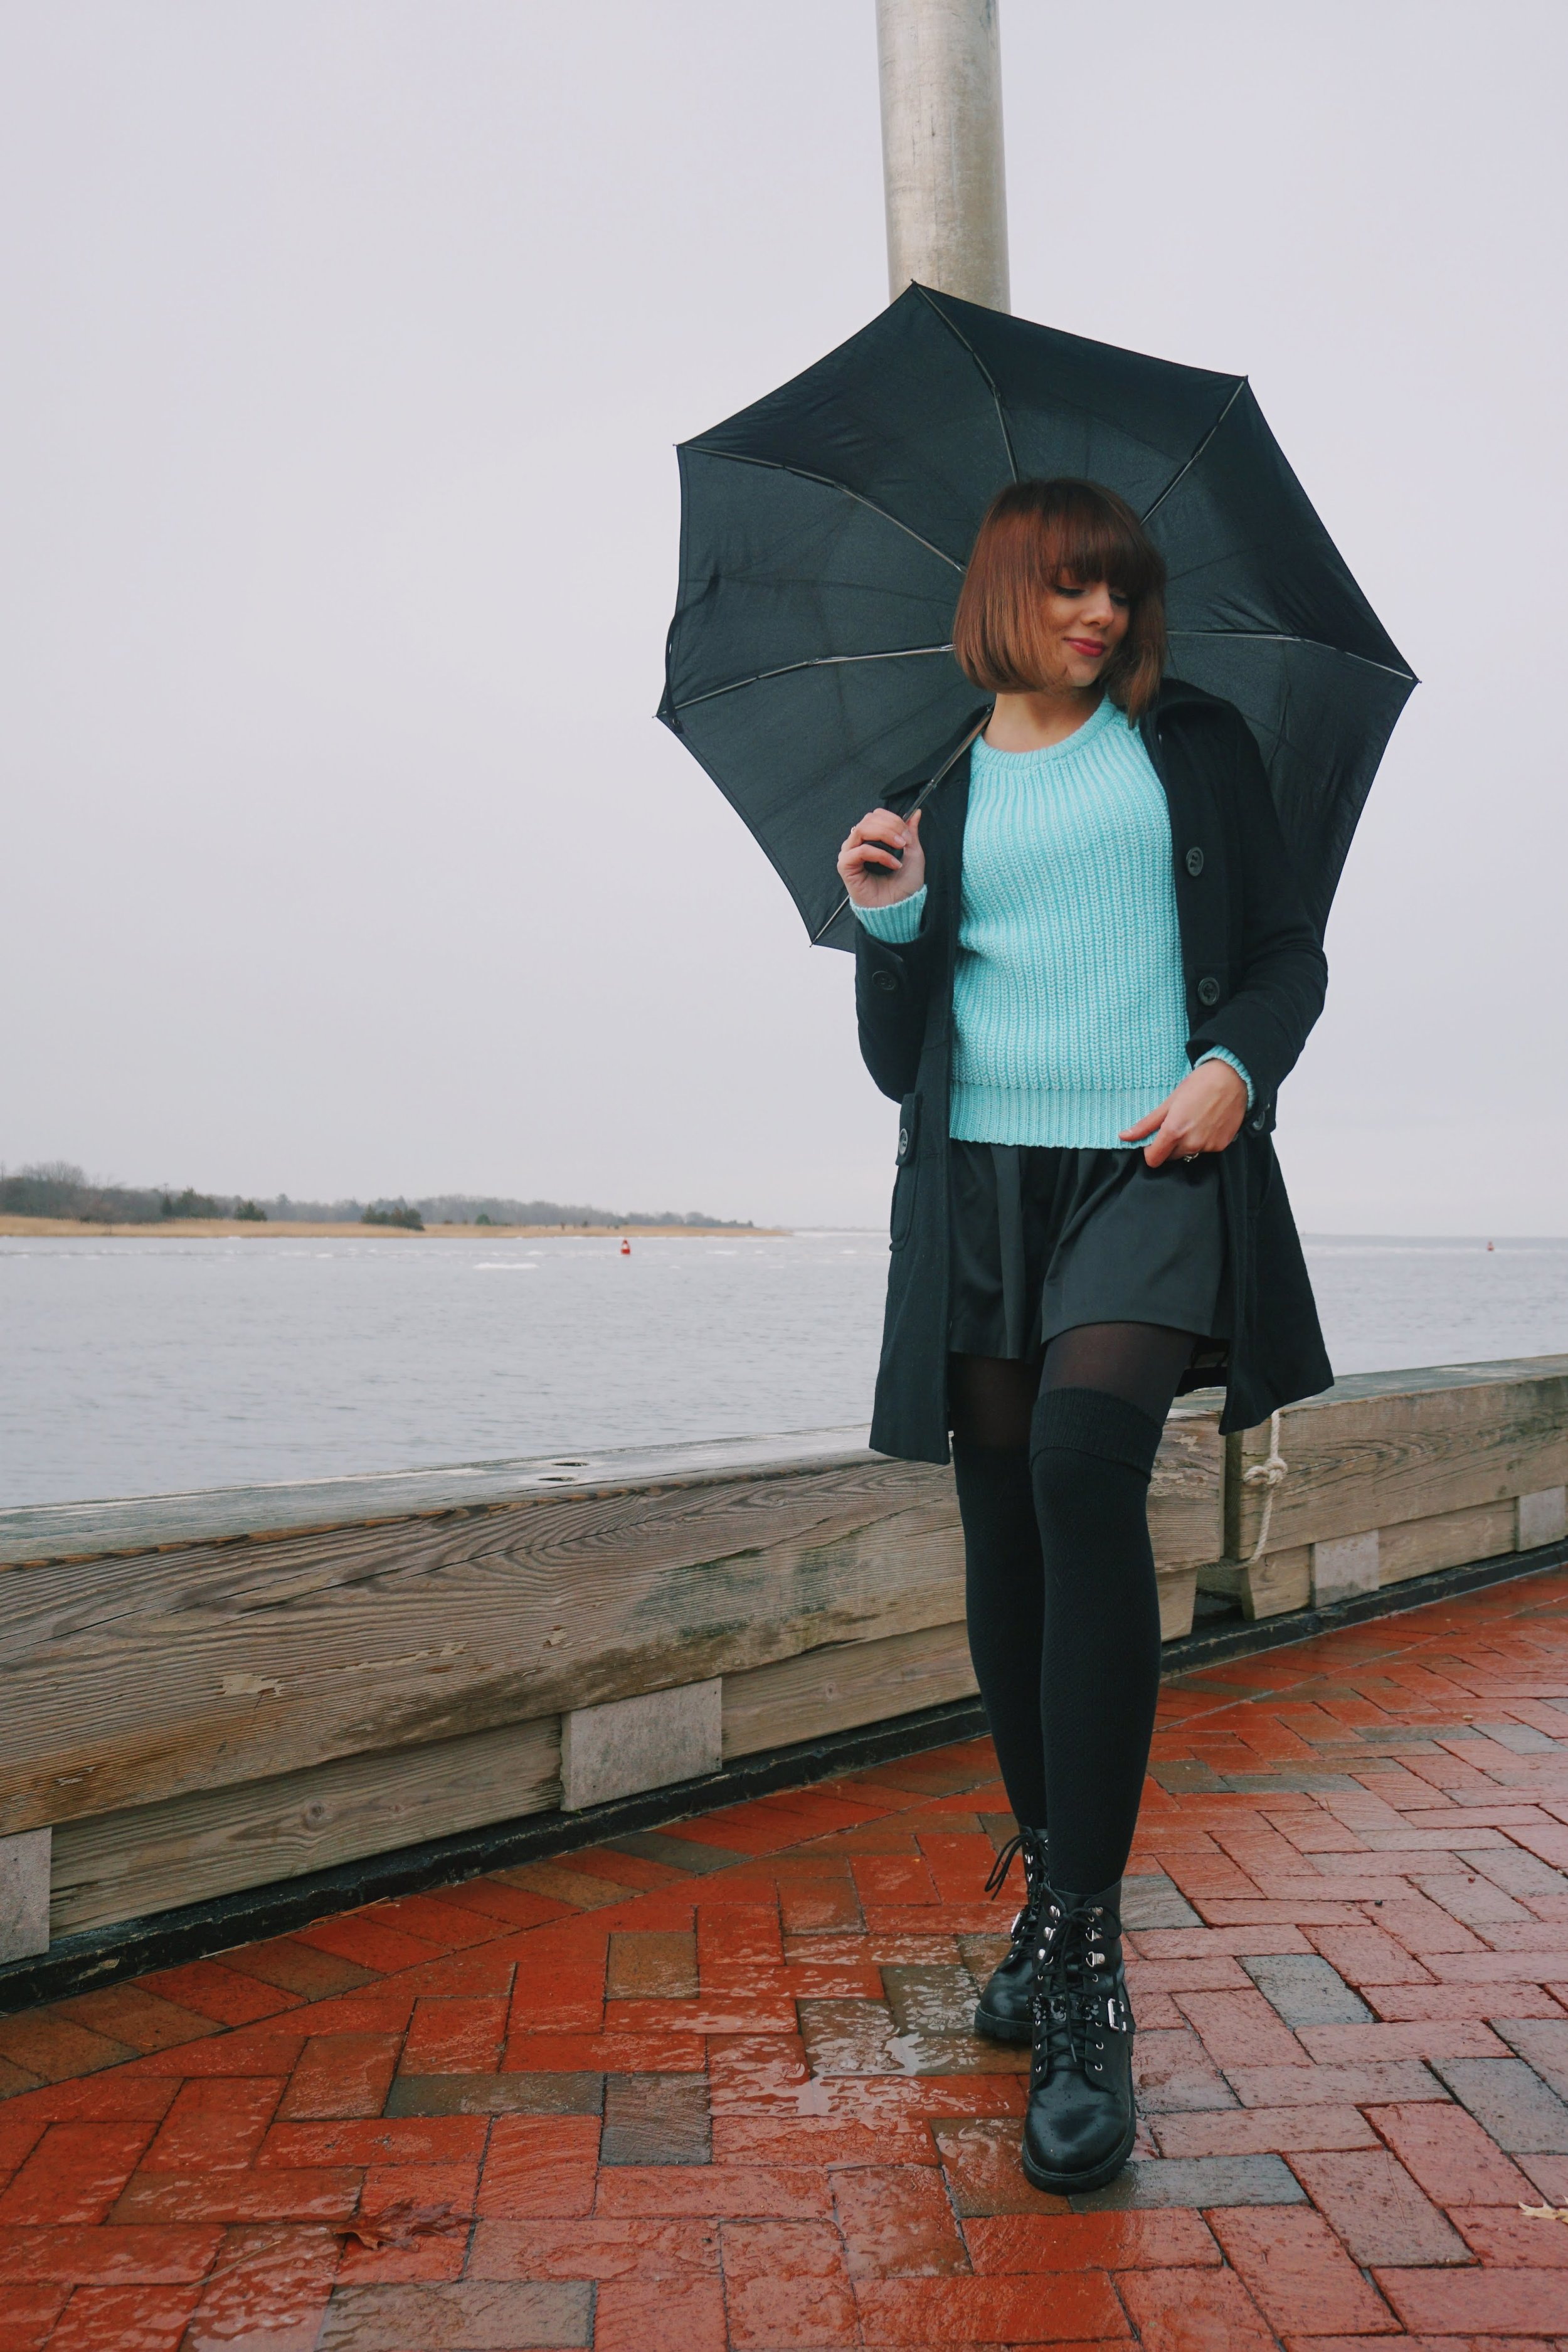 Girl posing near the ocean, wearing a cute winter outfit.